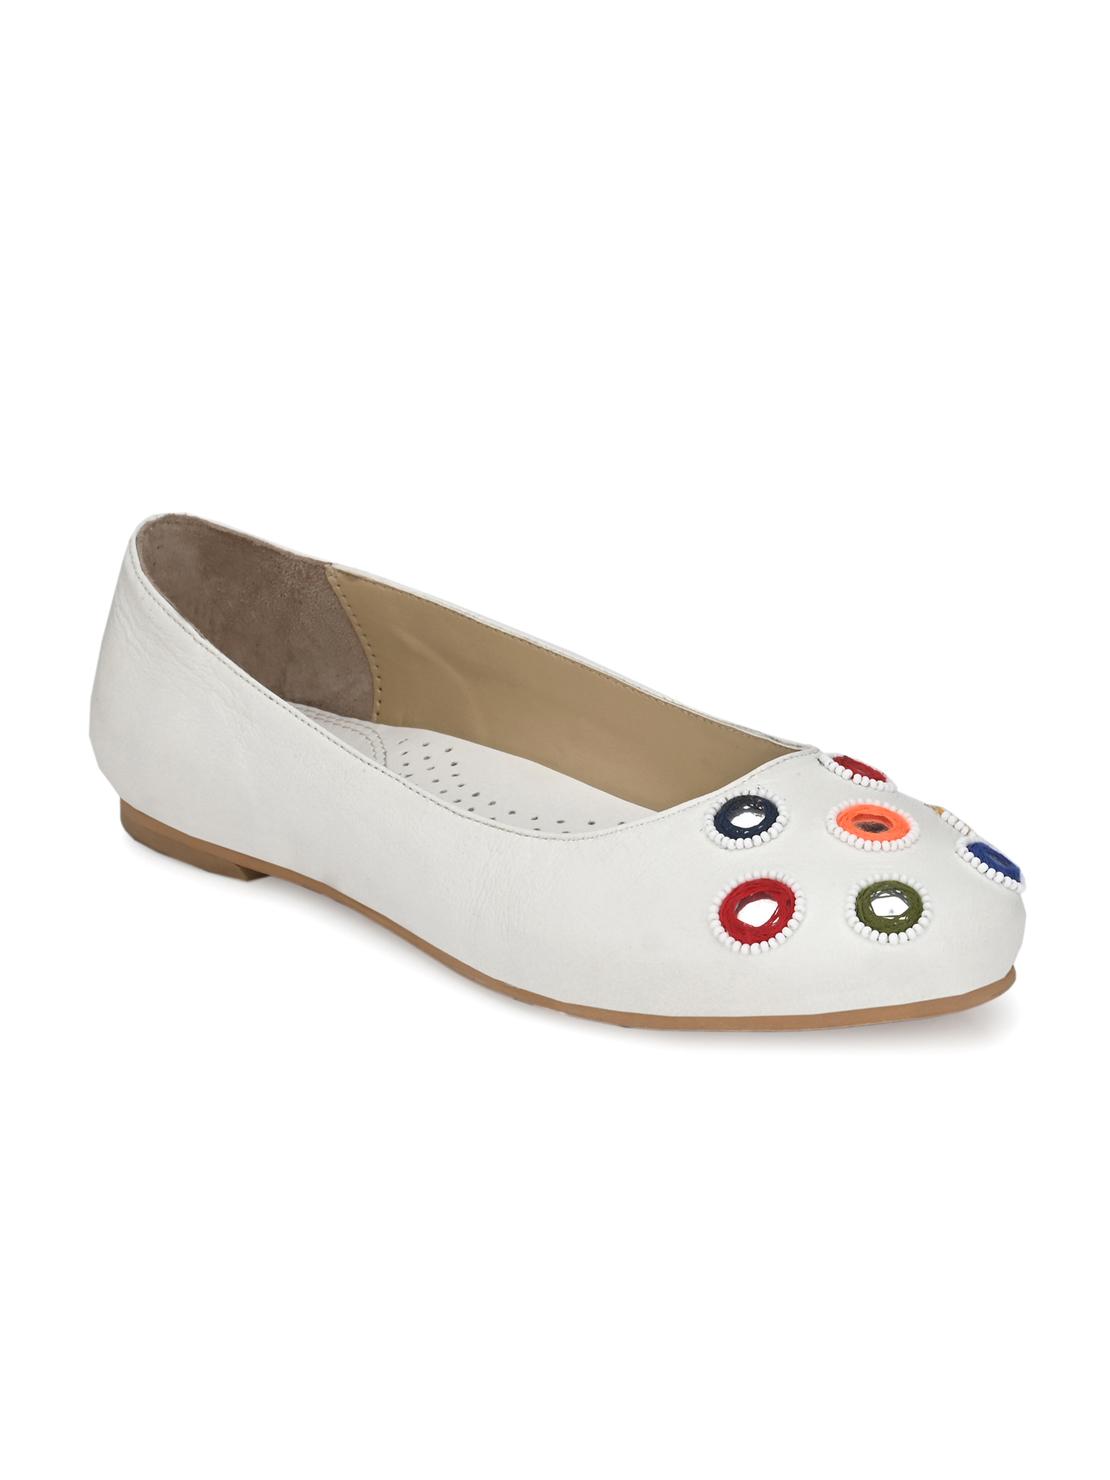 AADY AUSTIN | Aady Austin Women's Trendy White Round Toe Flats